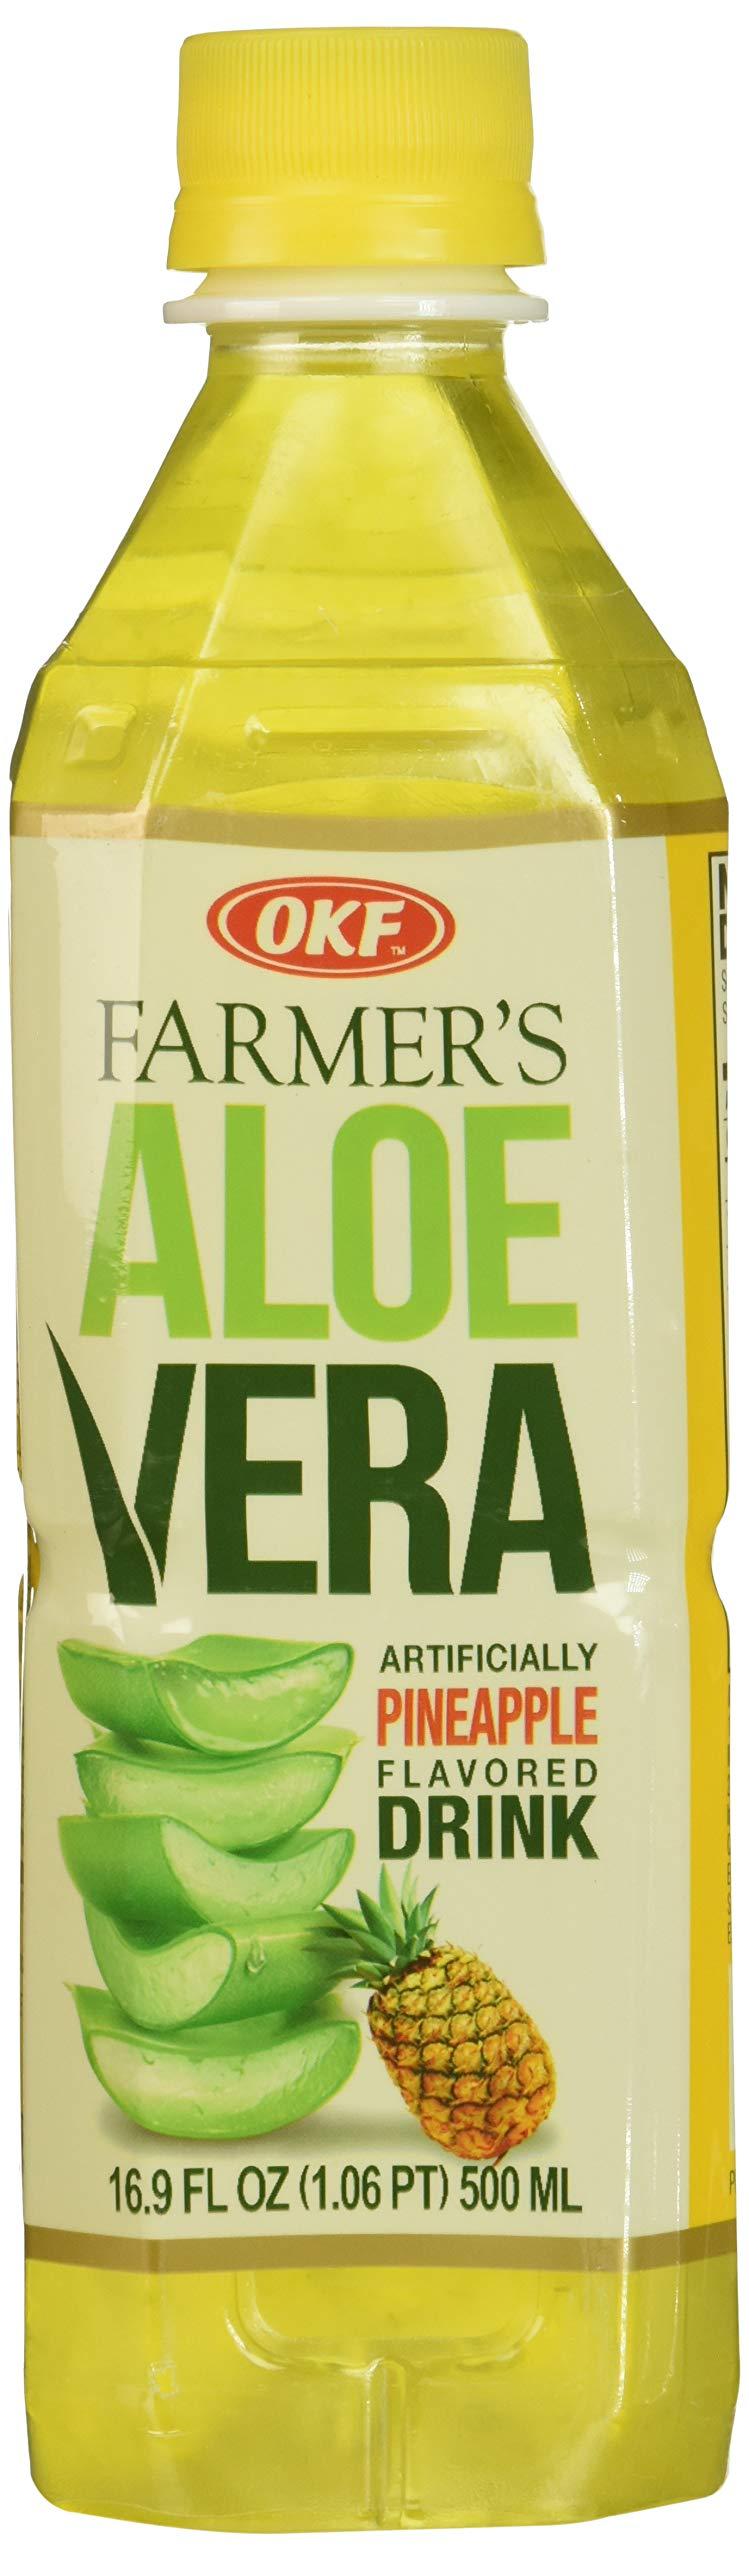 Farmers Aloe Vera Pineapple drink